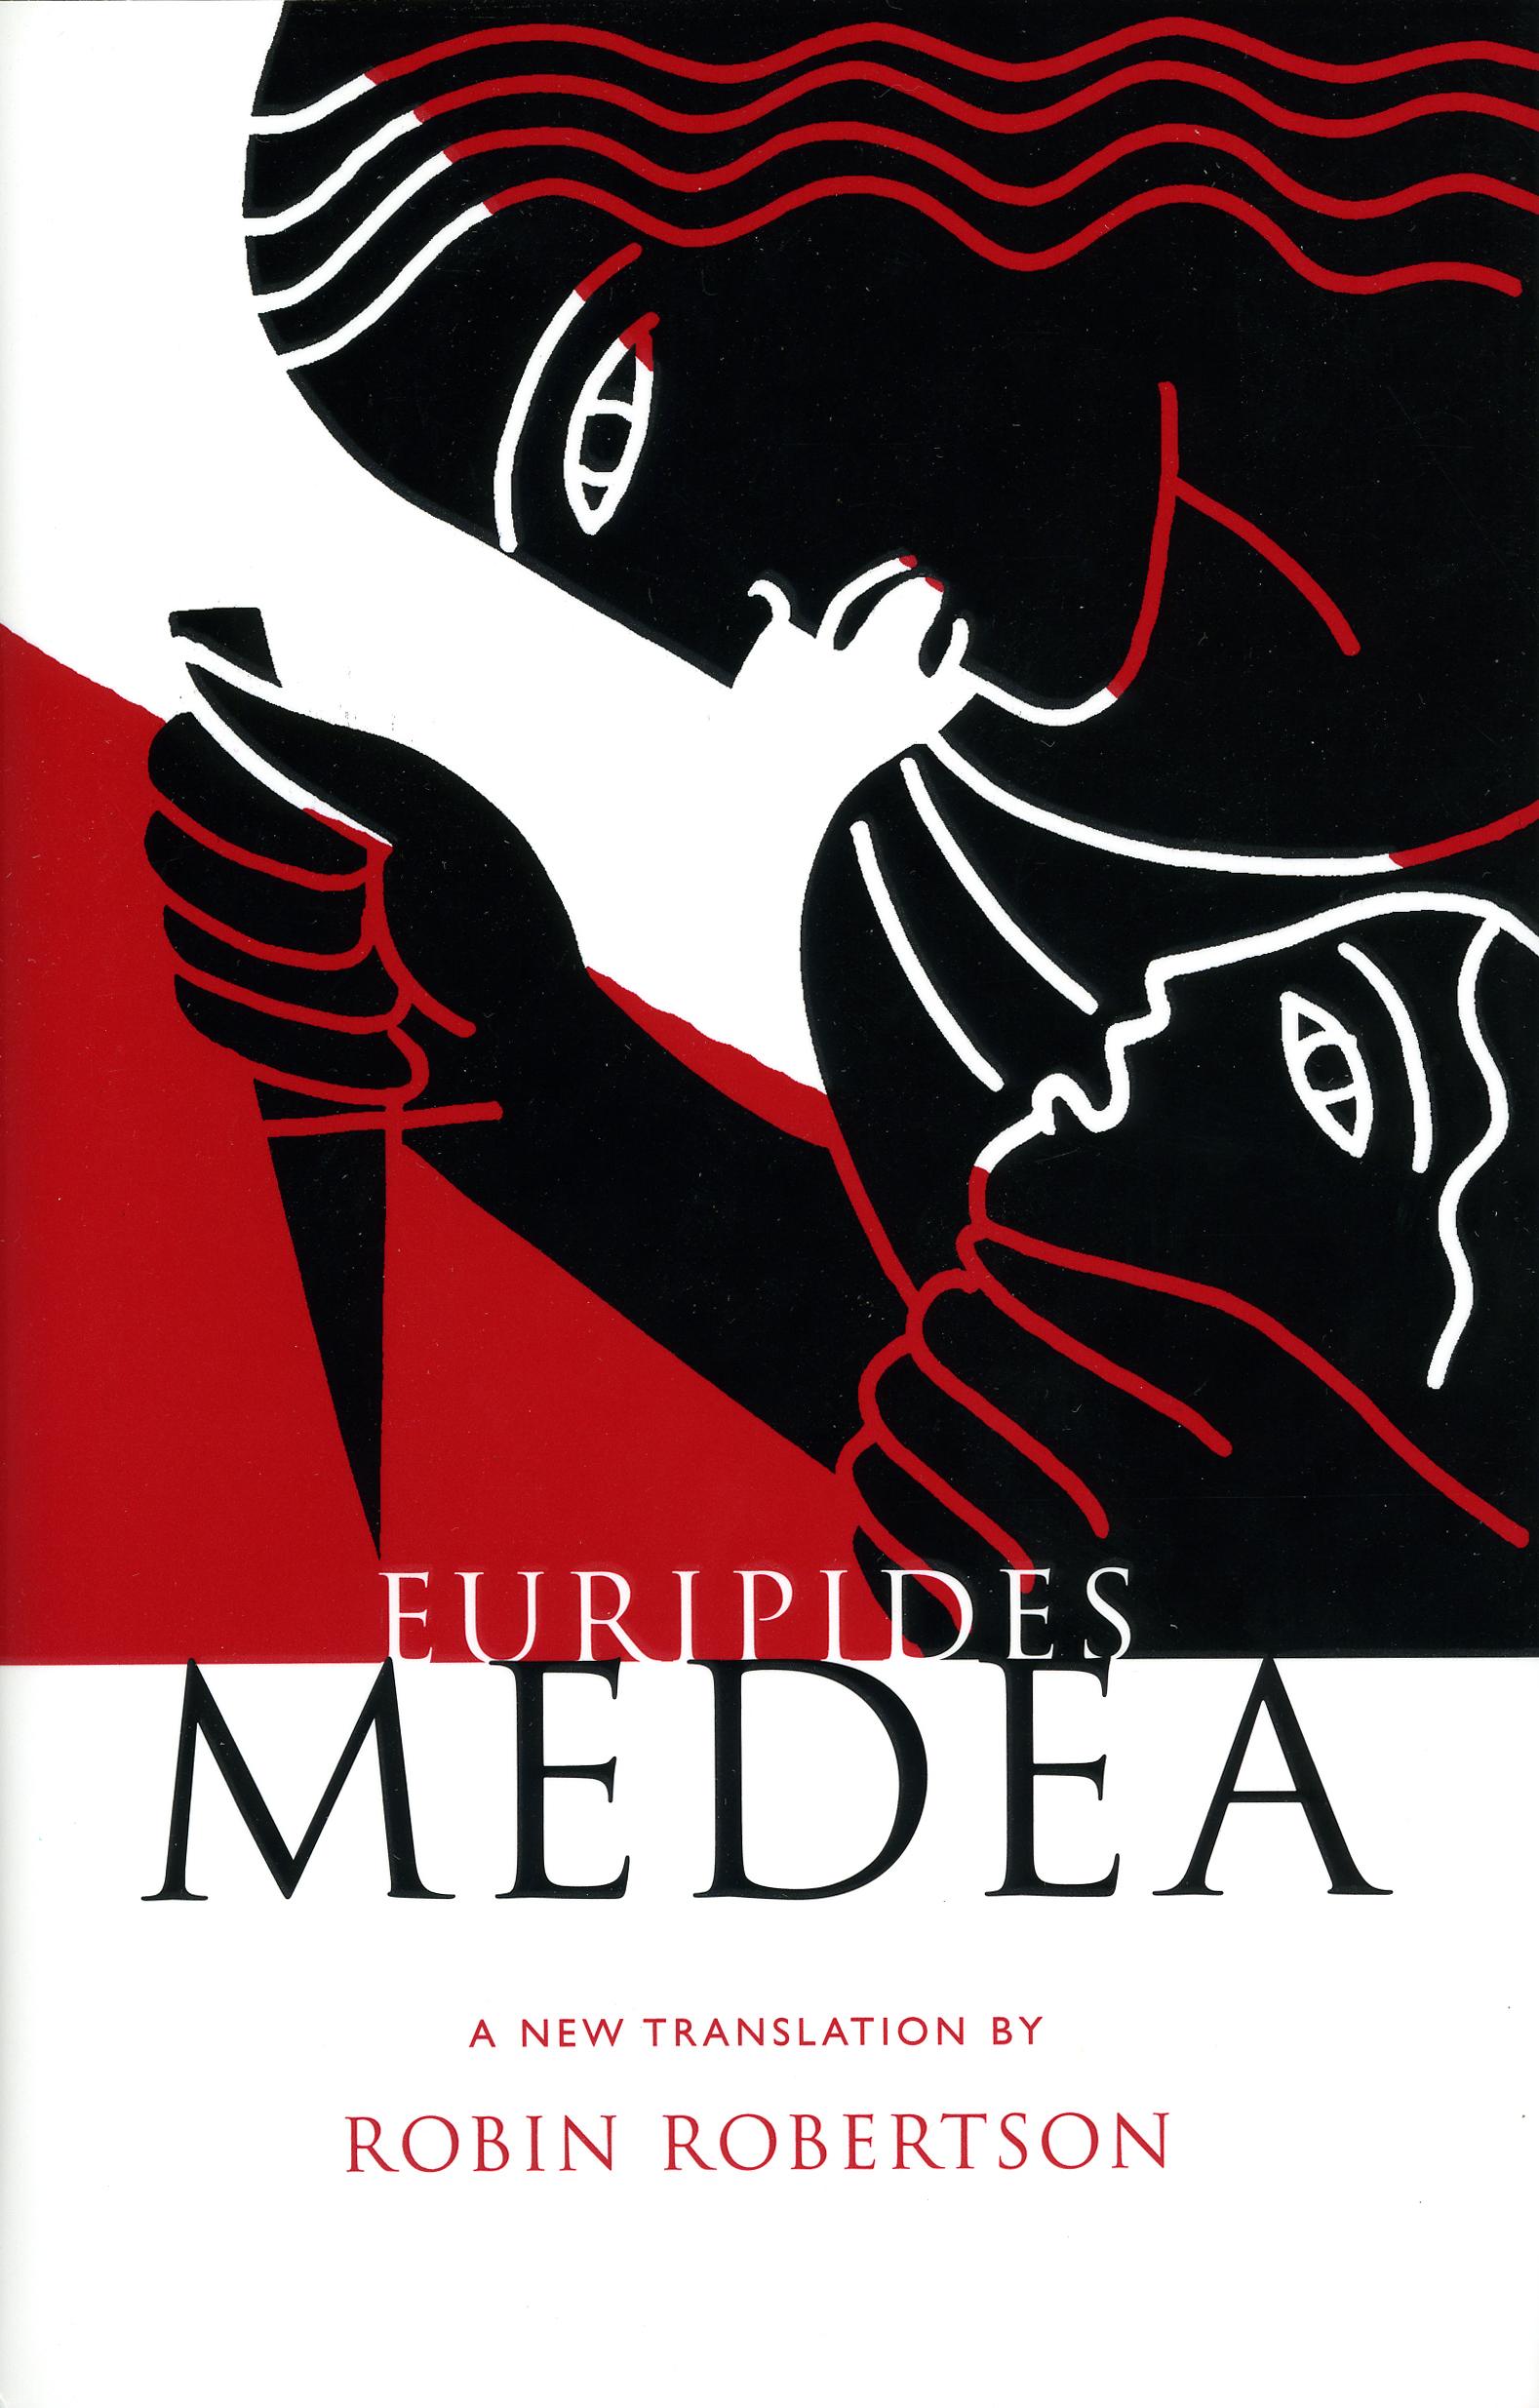 Euripides Medea by Robin Robertson